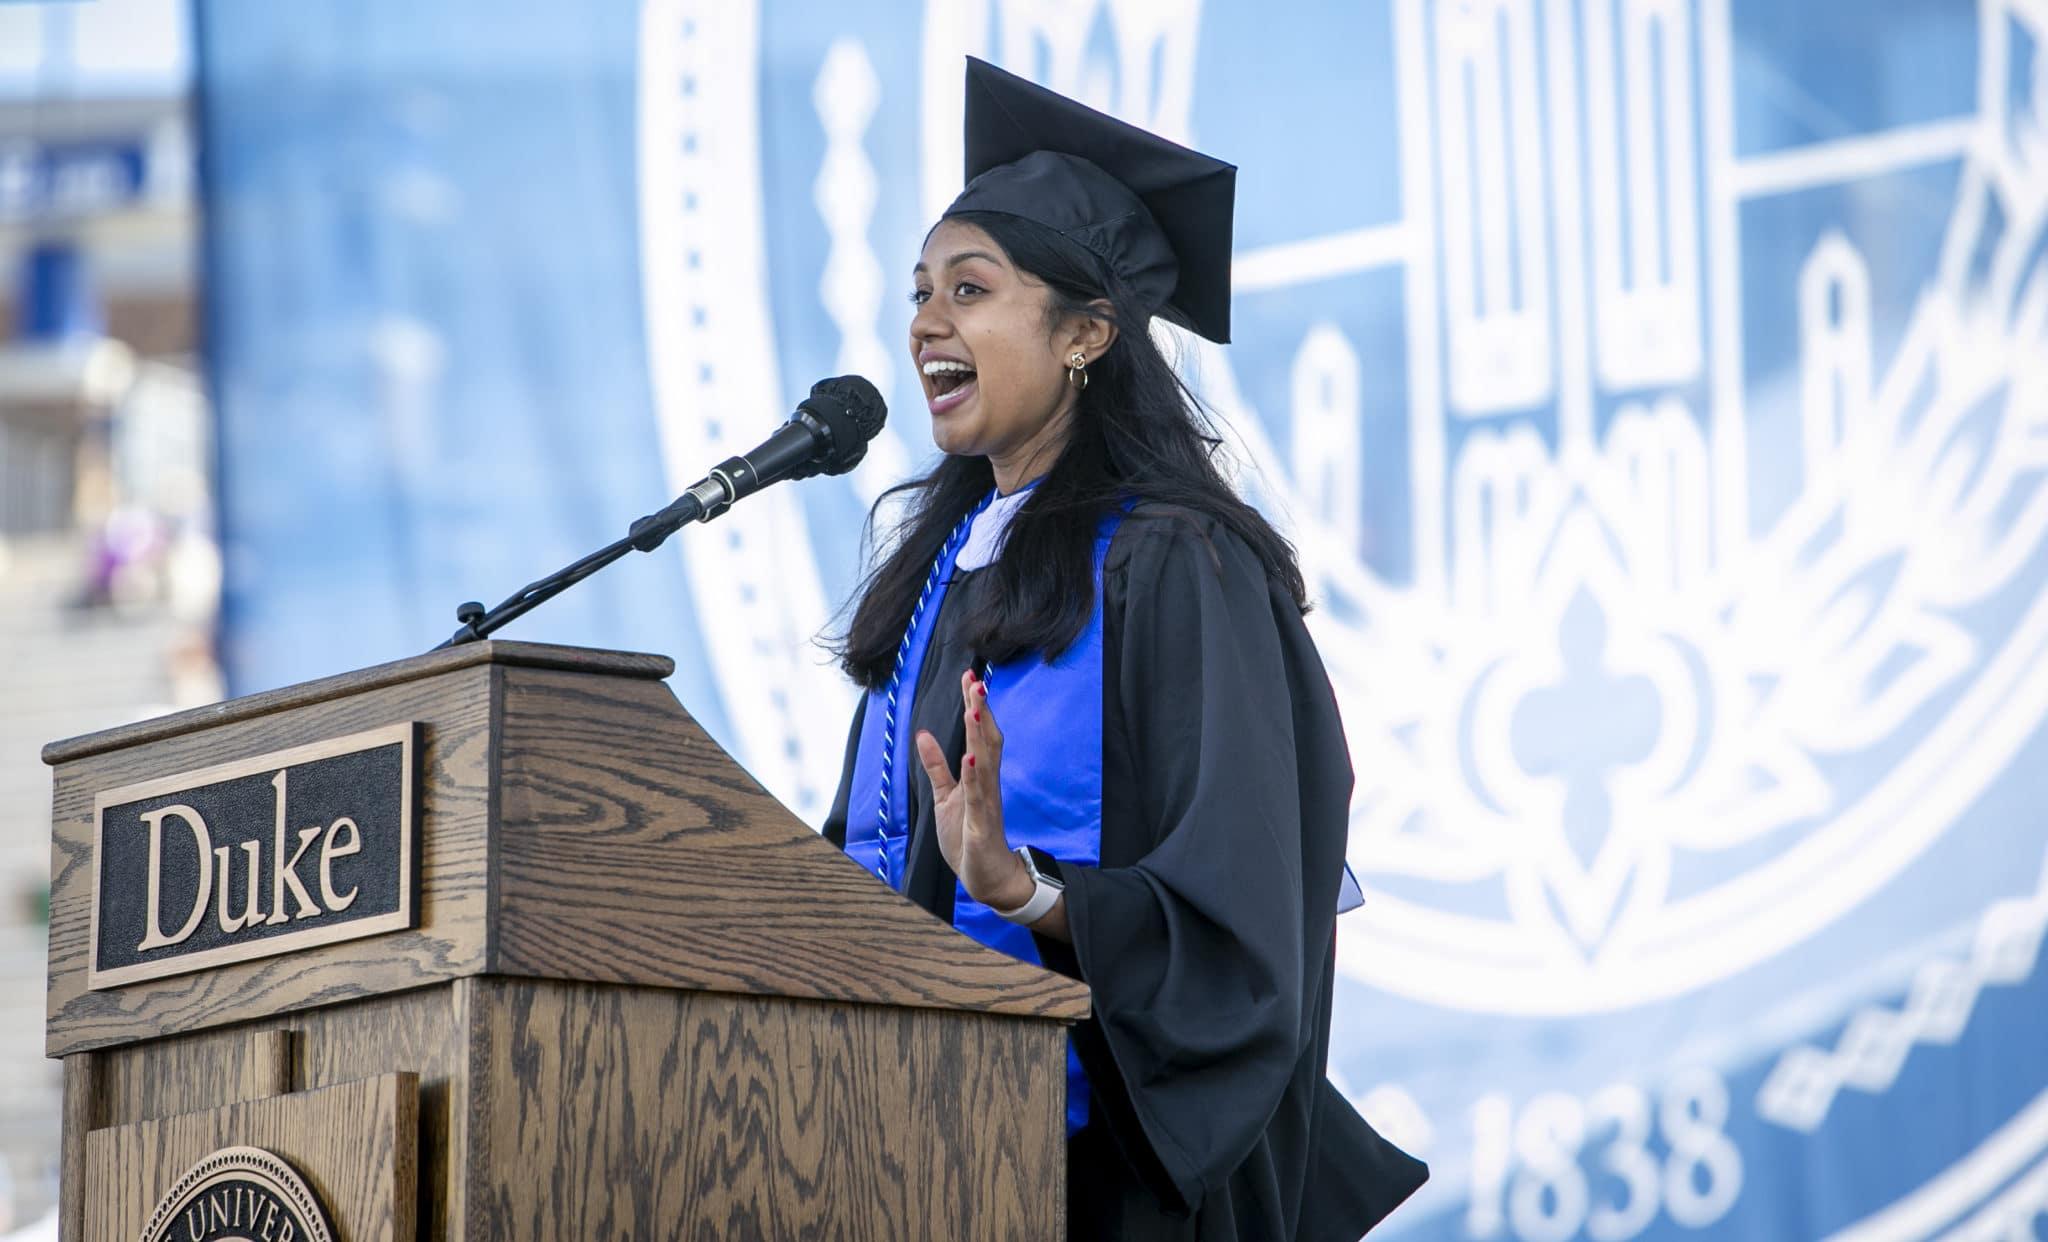 Meghana Sai Iragavarapu delivers the student address during Duke University's Commencement Ceremony on Sunday, May 2, 2021. John Legend, multiplatinum-selling singer-songwriter, actor, producer and philanthropist, delivered the keynote address.